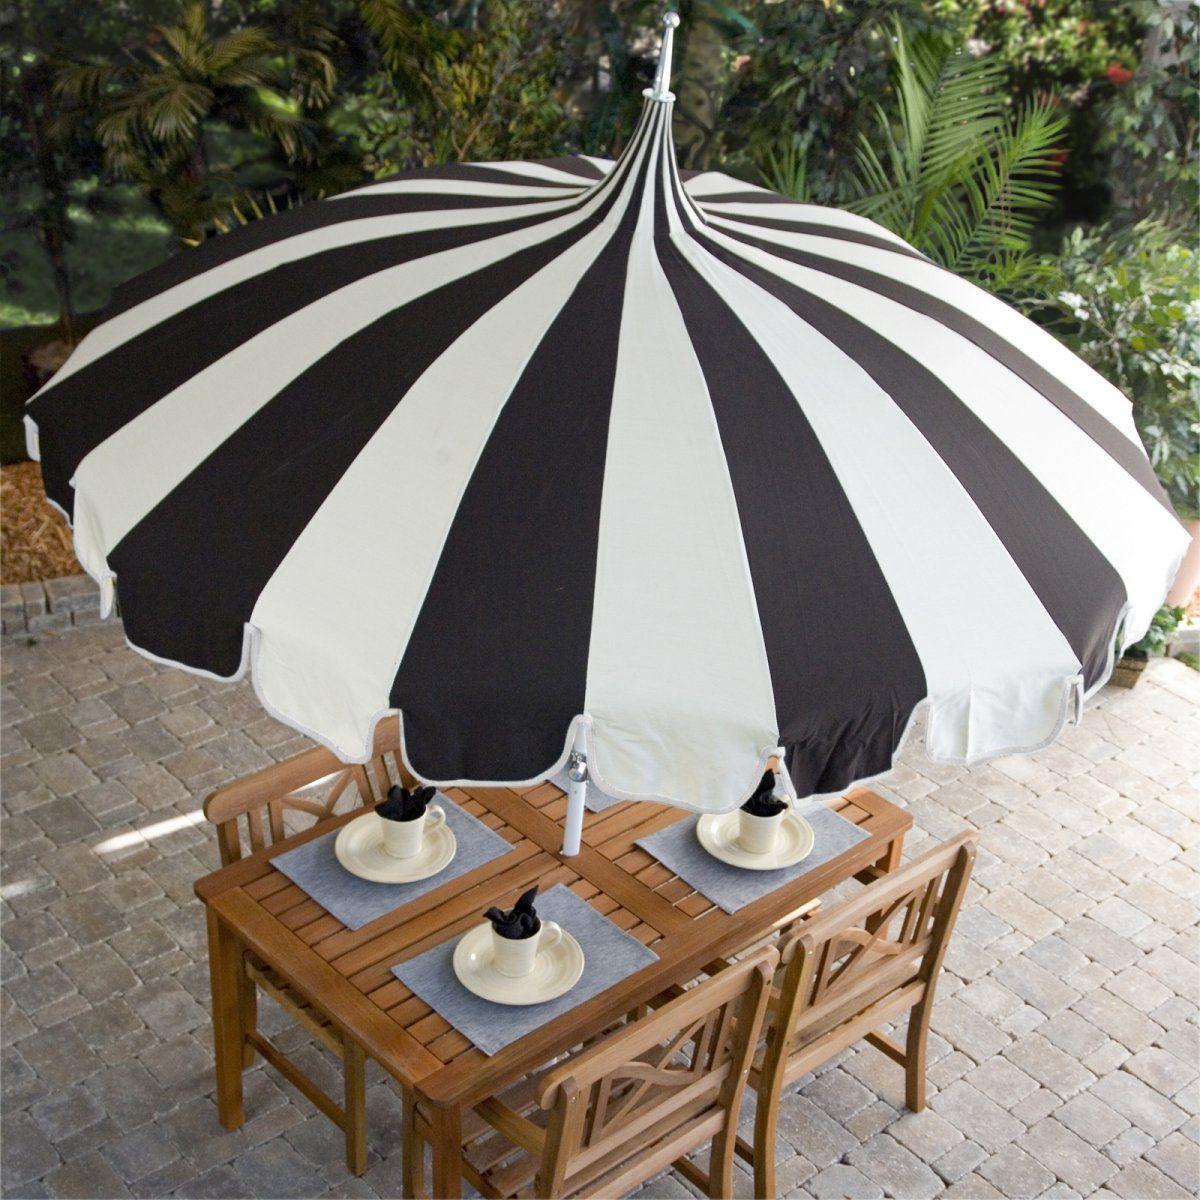 Delightful Pagoda Patio Umbrella By California Umbrella   The Custom Pagoda Design Of  This Colorful Patio Umbrella Will Make A Fun Atmosphere In Any Outdoor  Setting.